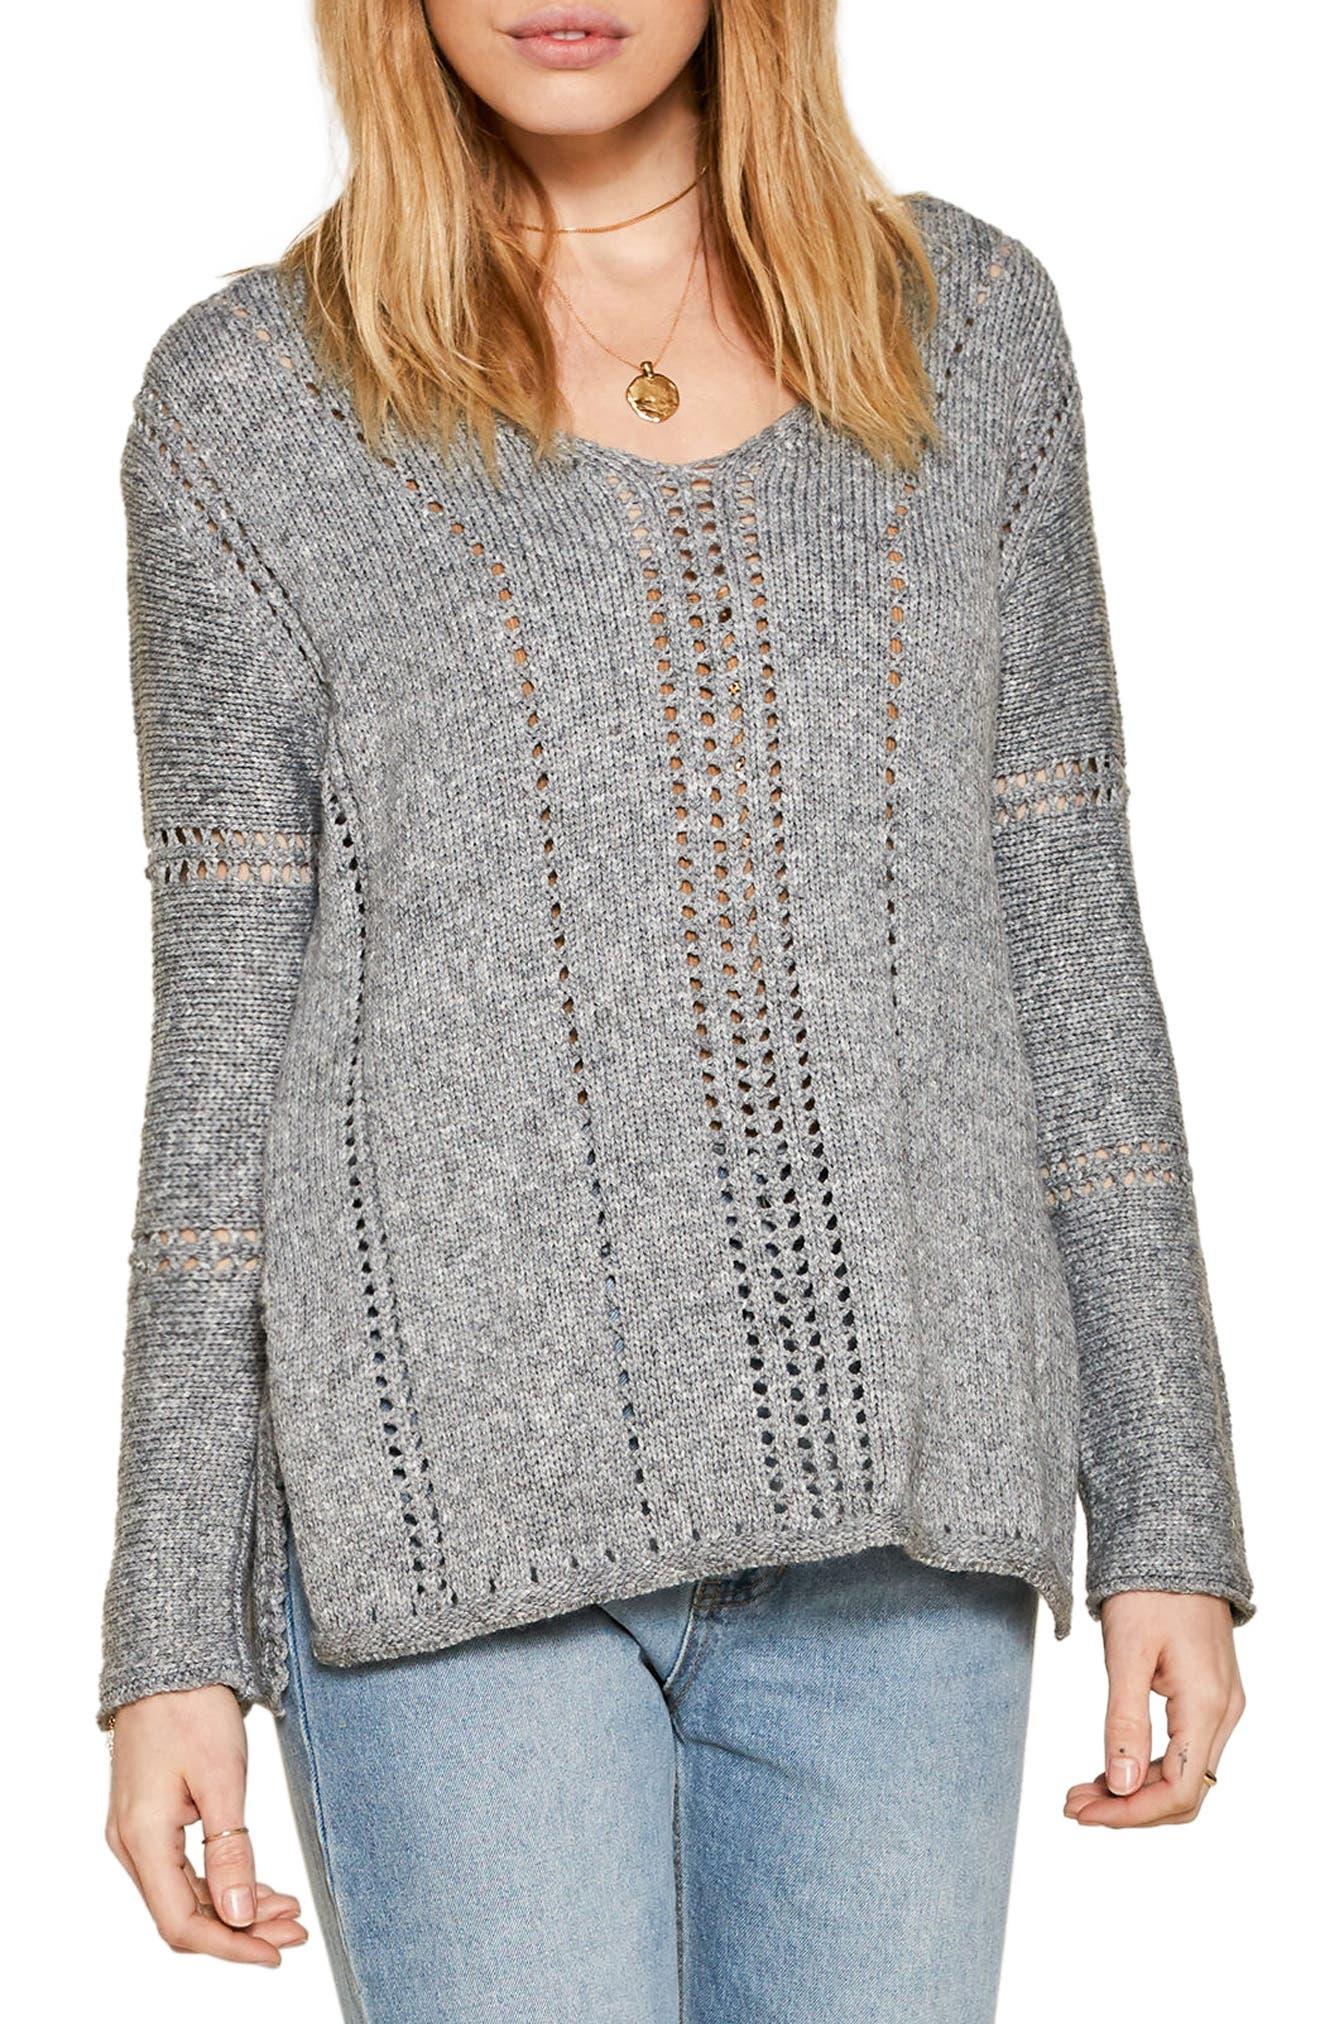 Main Image - Amuse Society Rickerson Sweater